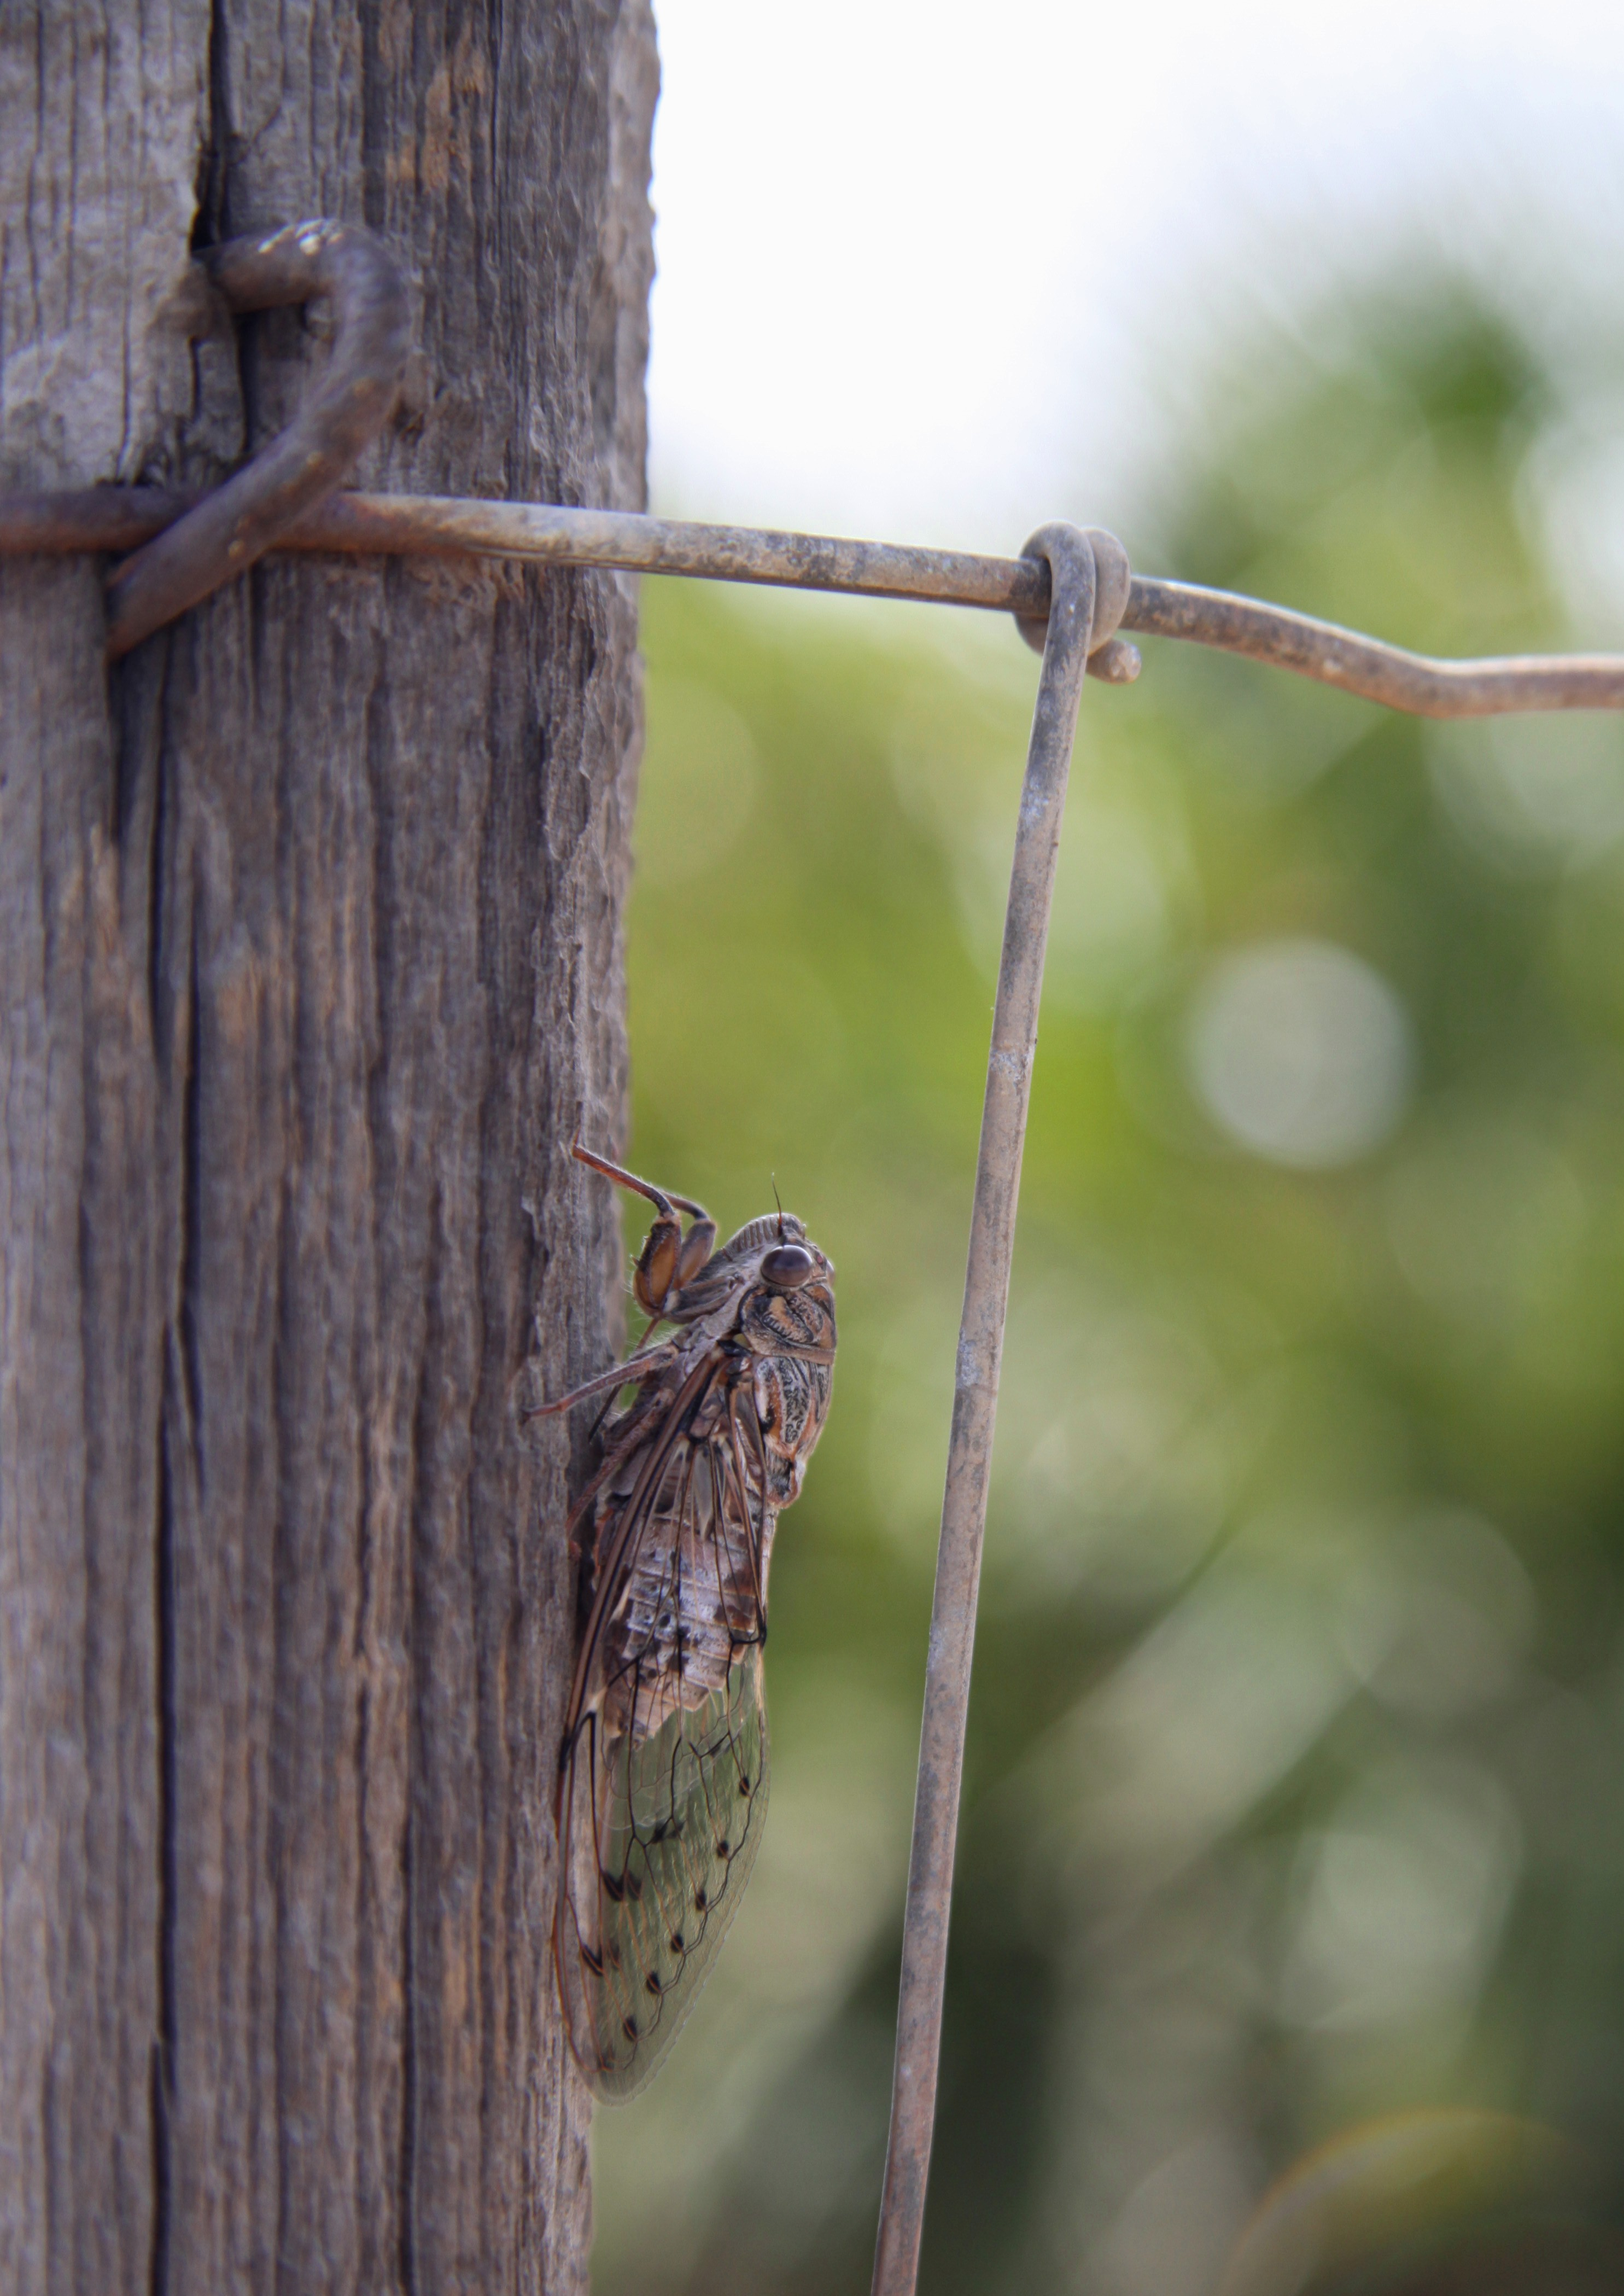 Cicada_analucia_andrew_forbes